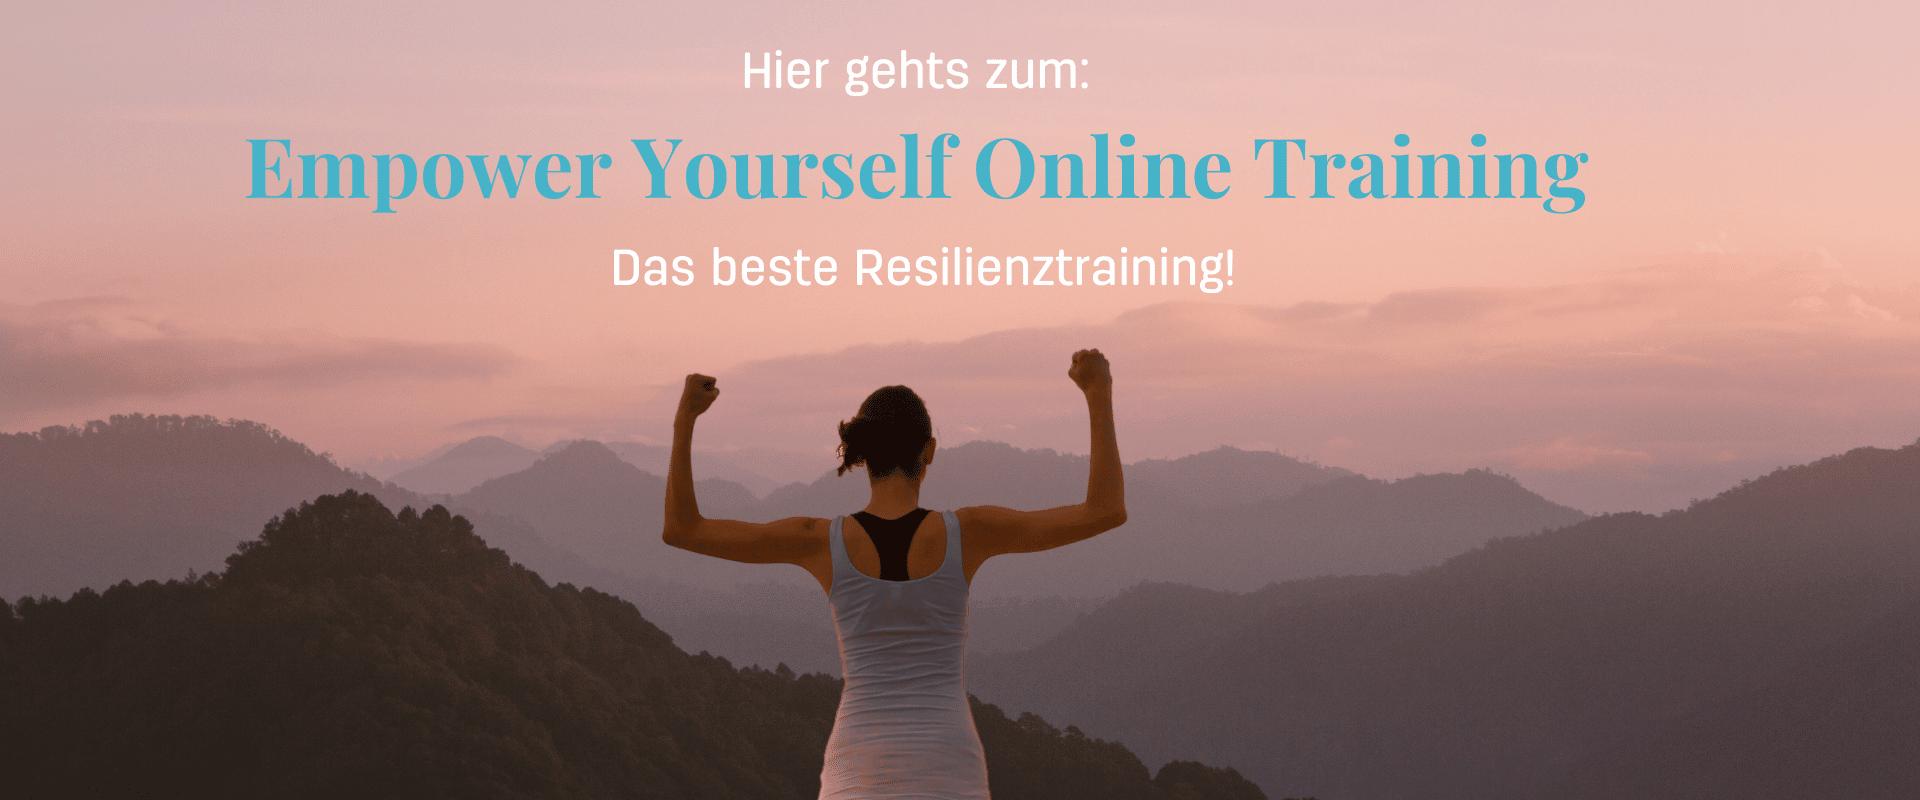 Empower Yourself Online Training